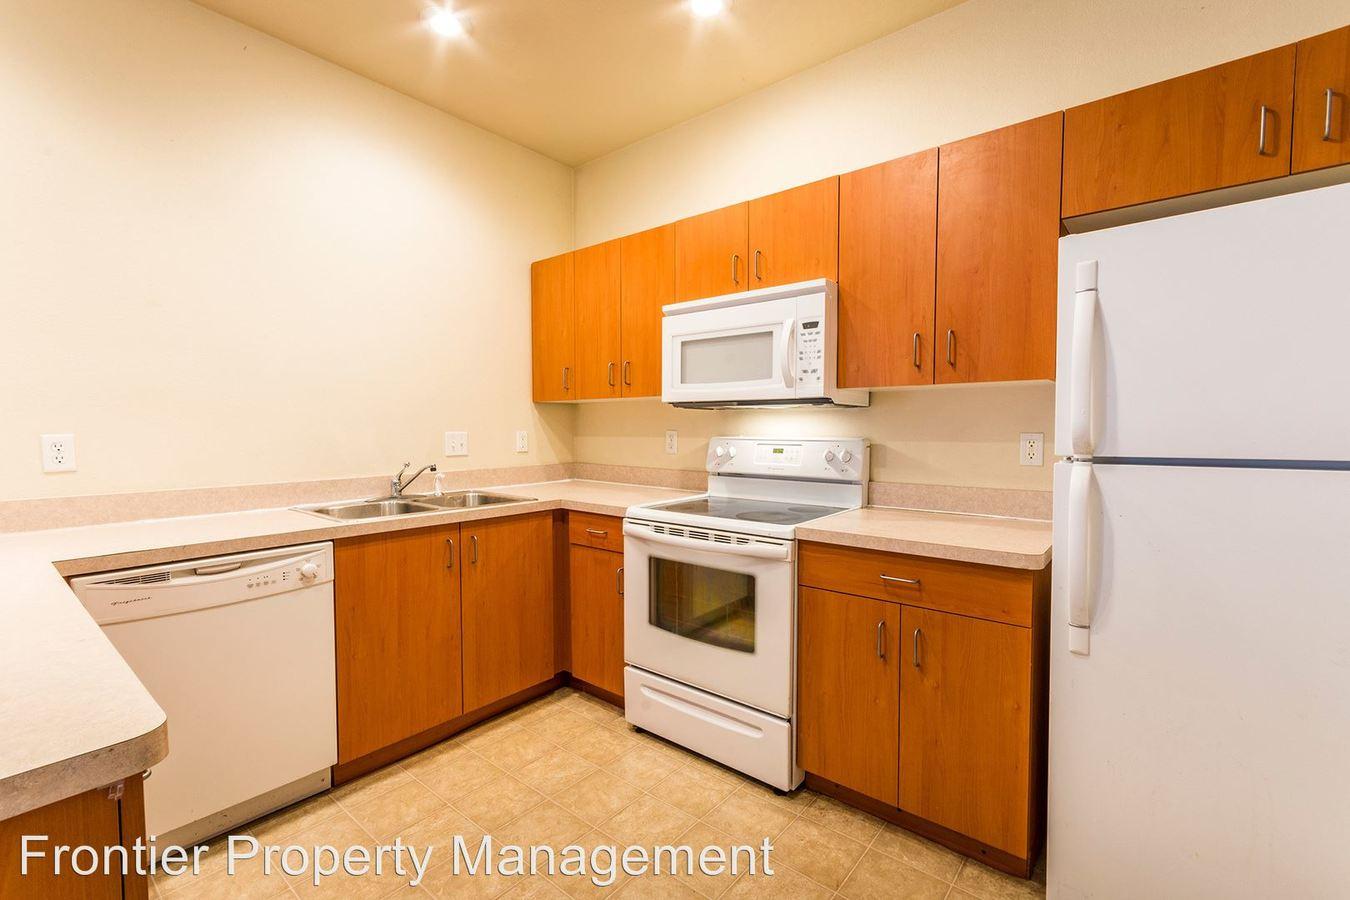 2 Bedrooms 1 Bathroom Apartment for rent at 901 Moro St. in Manhattan, KS